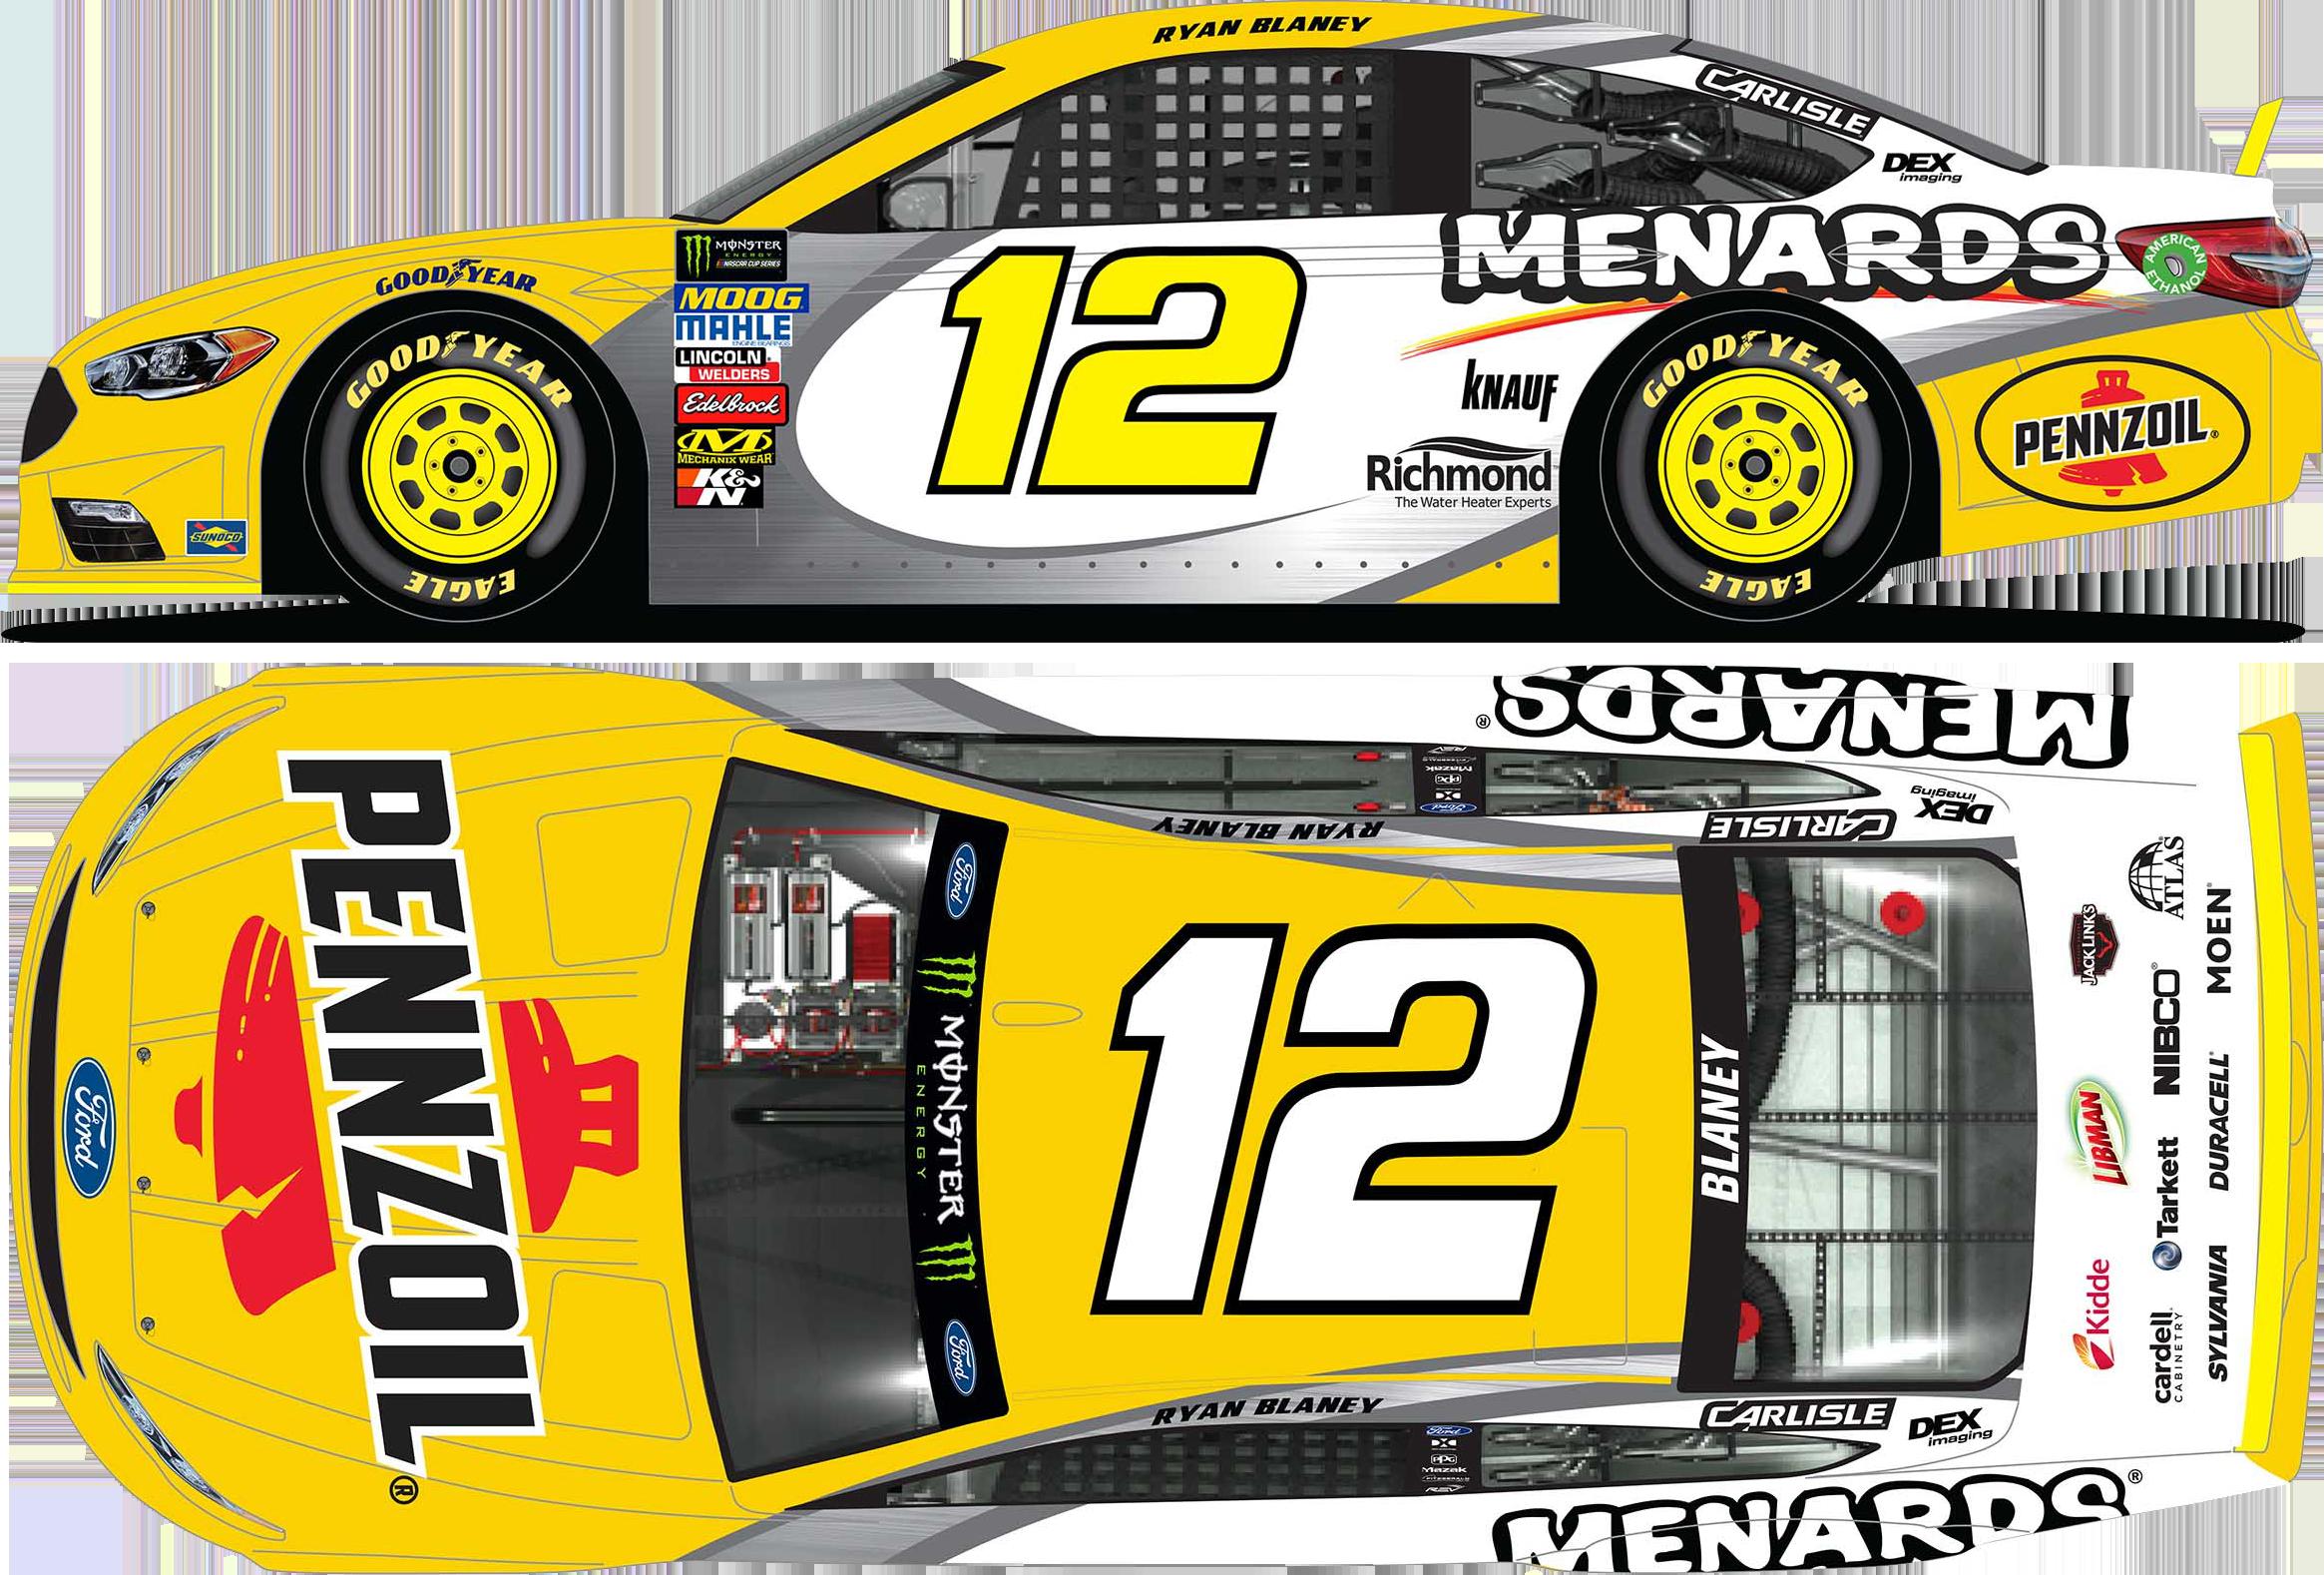 2018 Ryan Blaney 1/24th Pennzoil/Menards Elite car